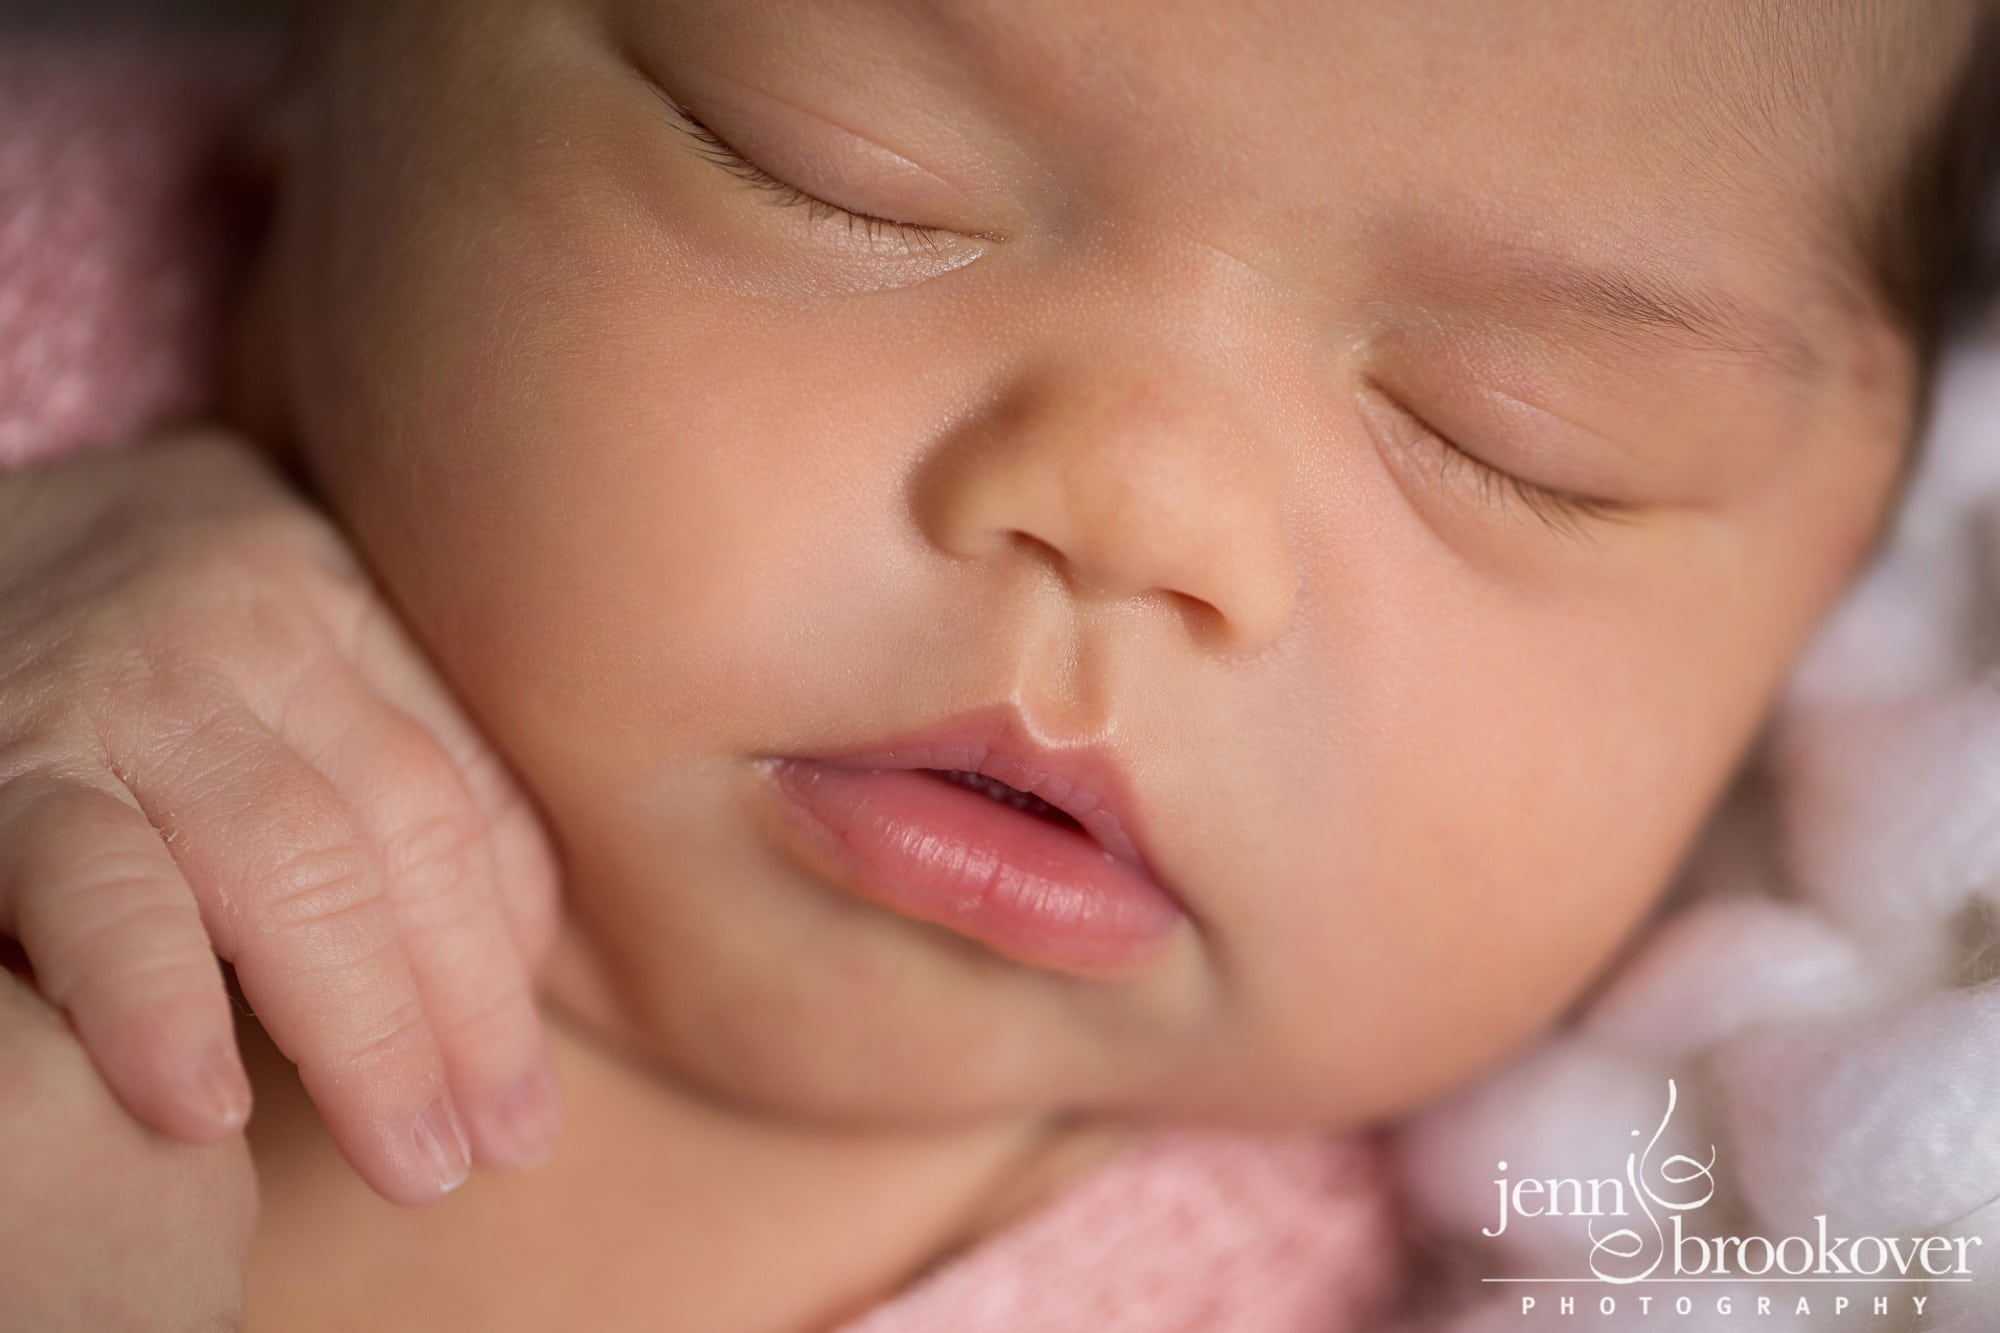 newborn portrait close up on hands, macro taken by Jenn Brookover in San Antonio Texas